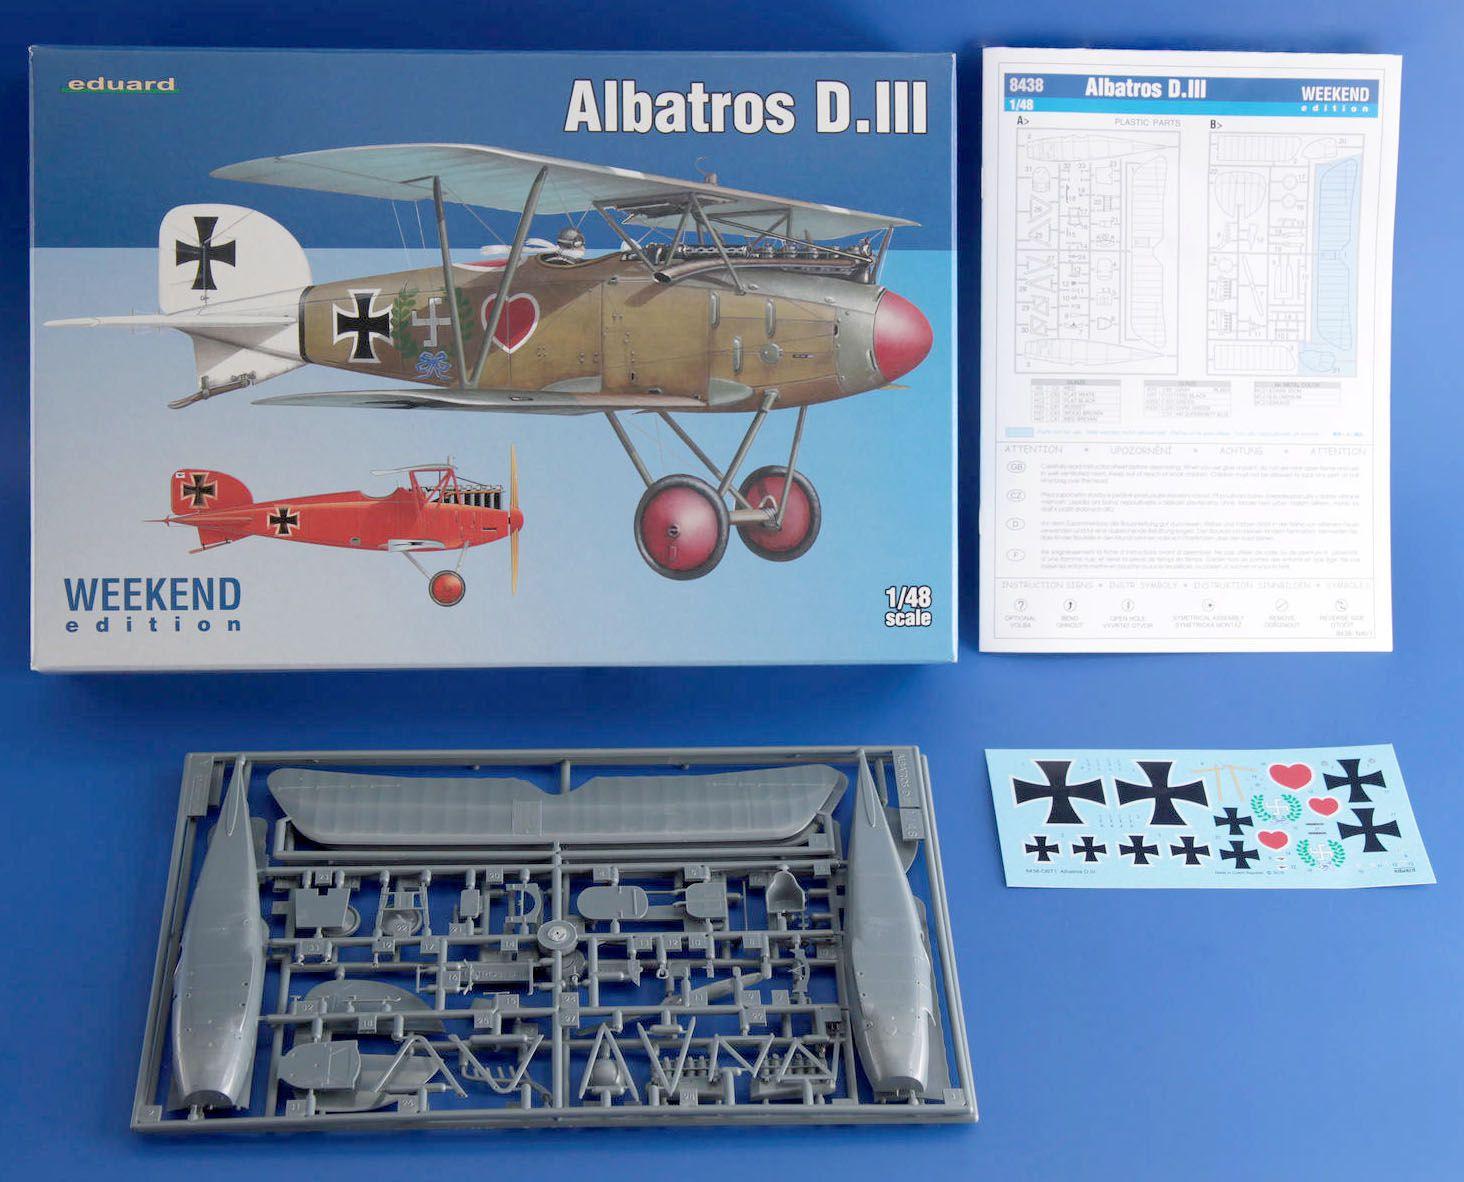 Albatros D.III - 1/48 - Eduard 8438  - BLIMPS COMÉRCIO ELETRÔNICO